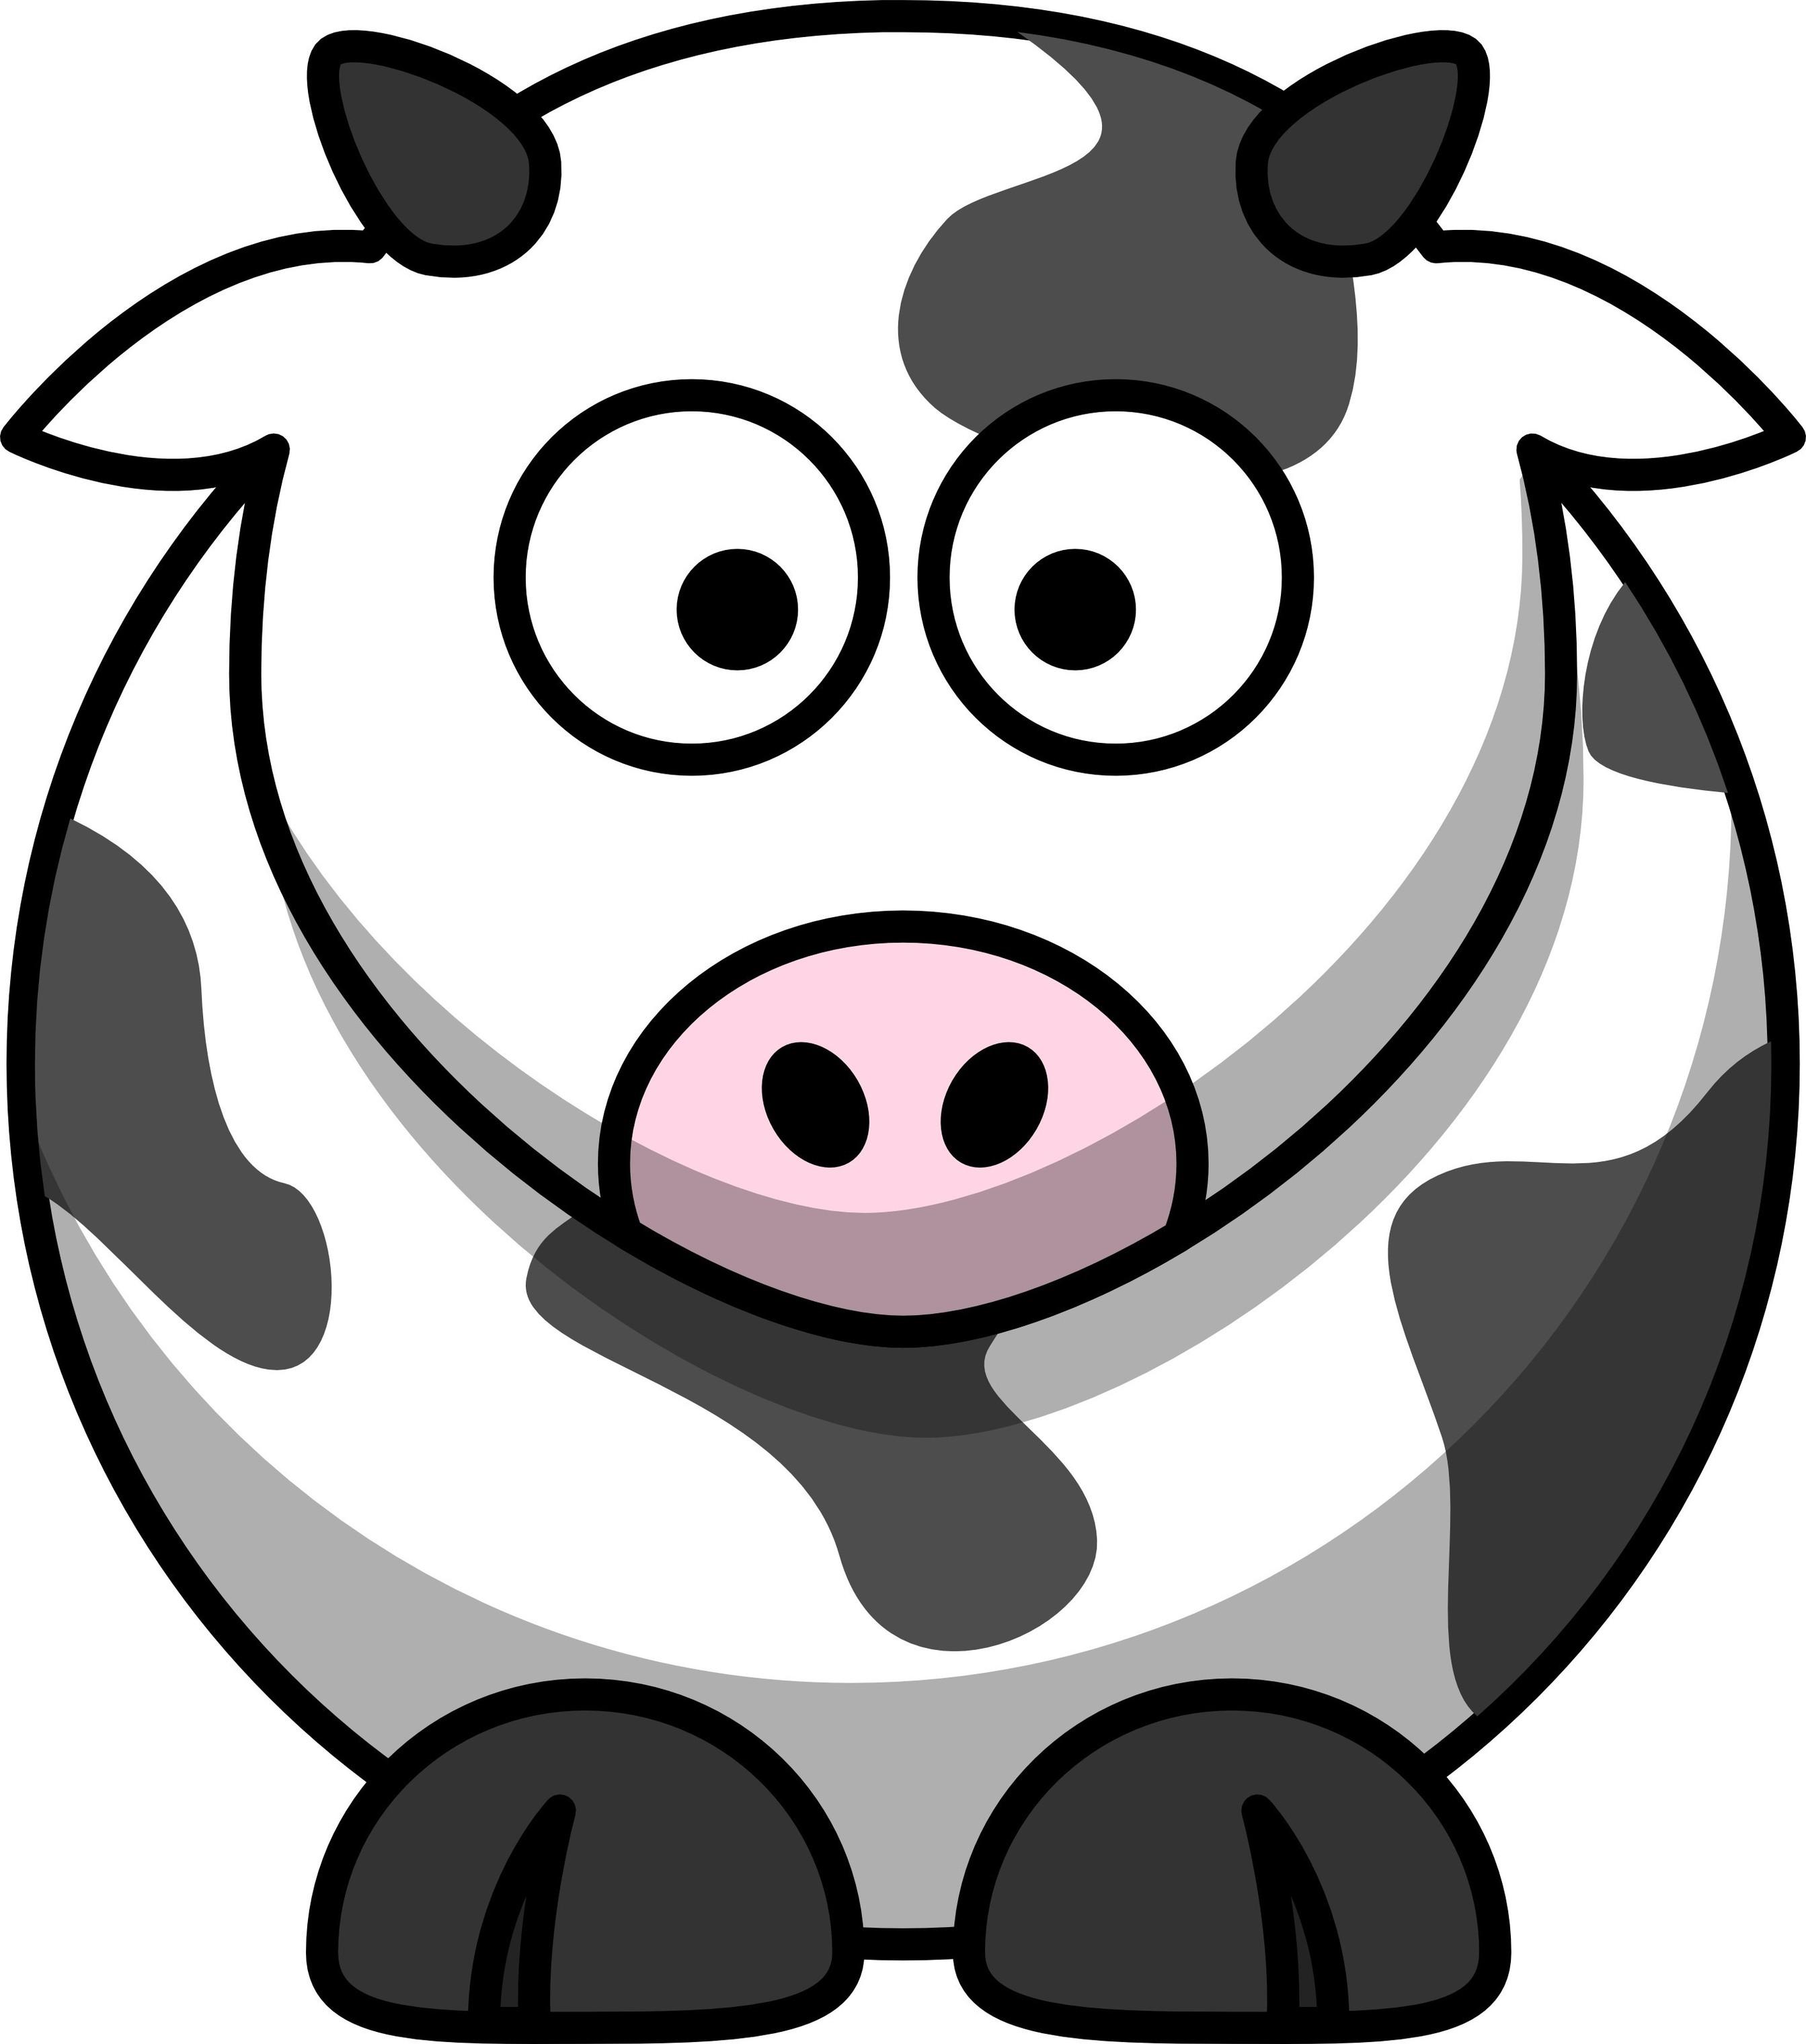 Free Cartoon Farmer Cliparts, Download Free Clip Art, Free.